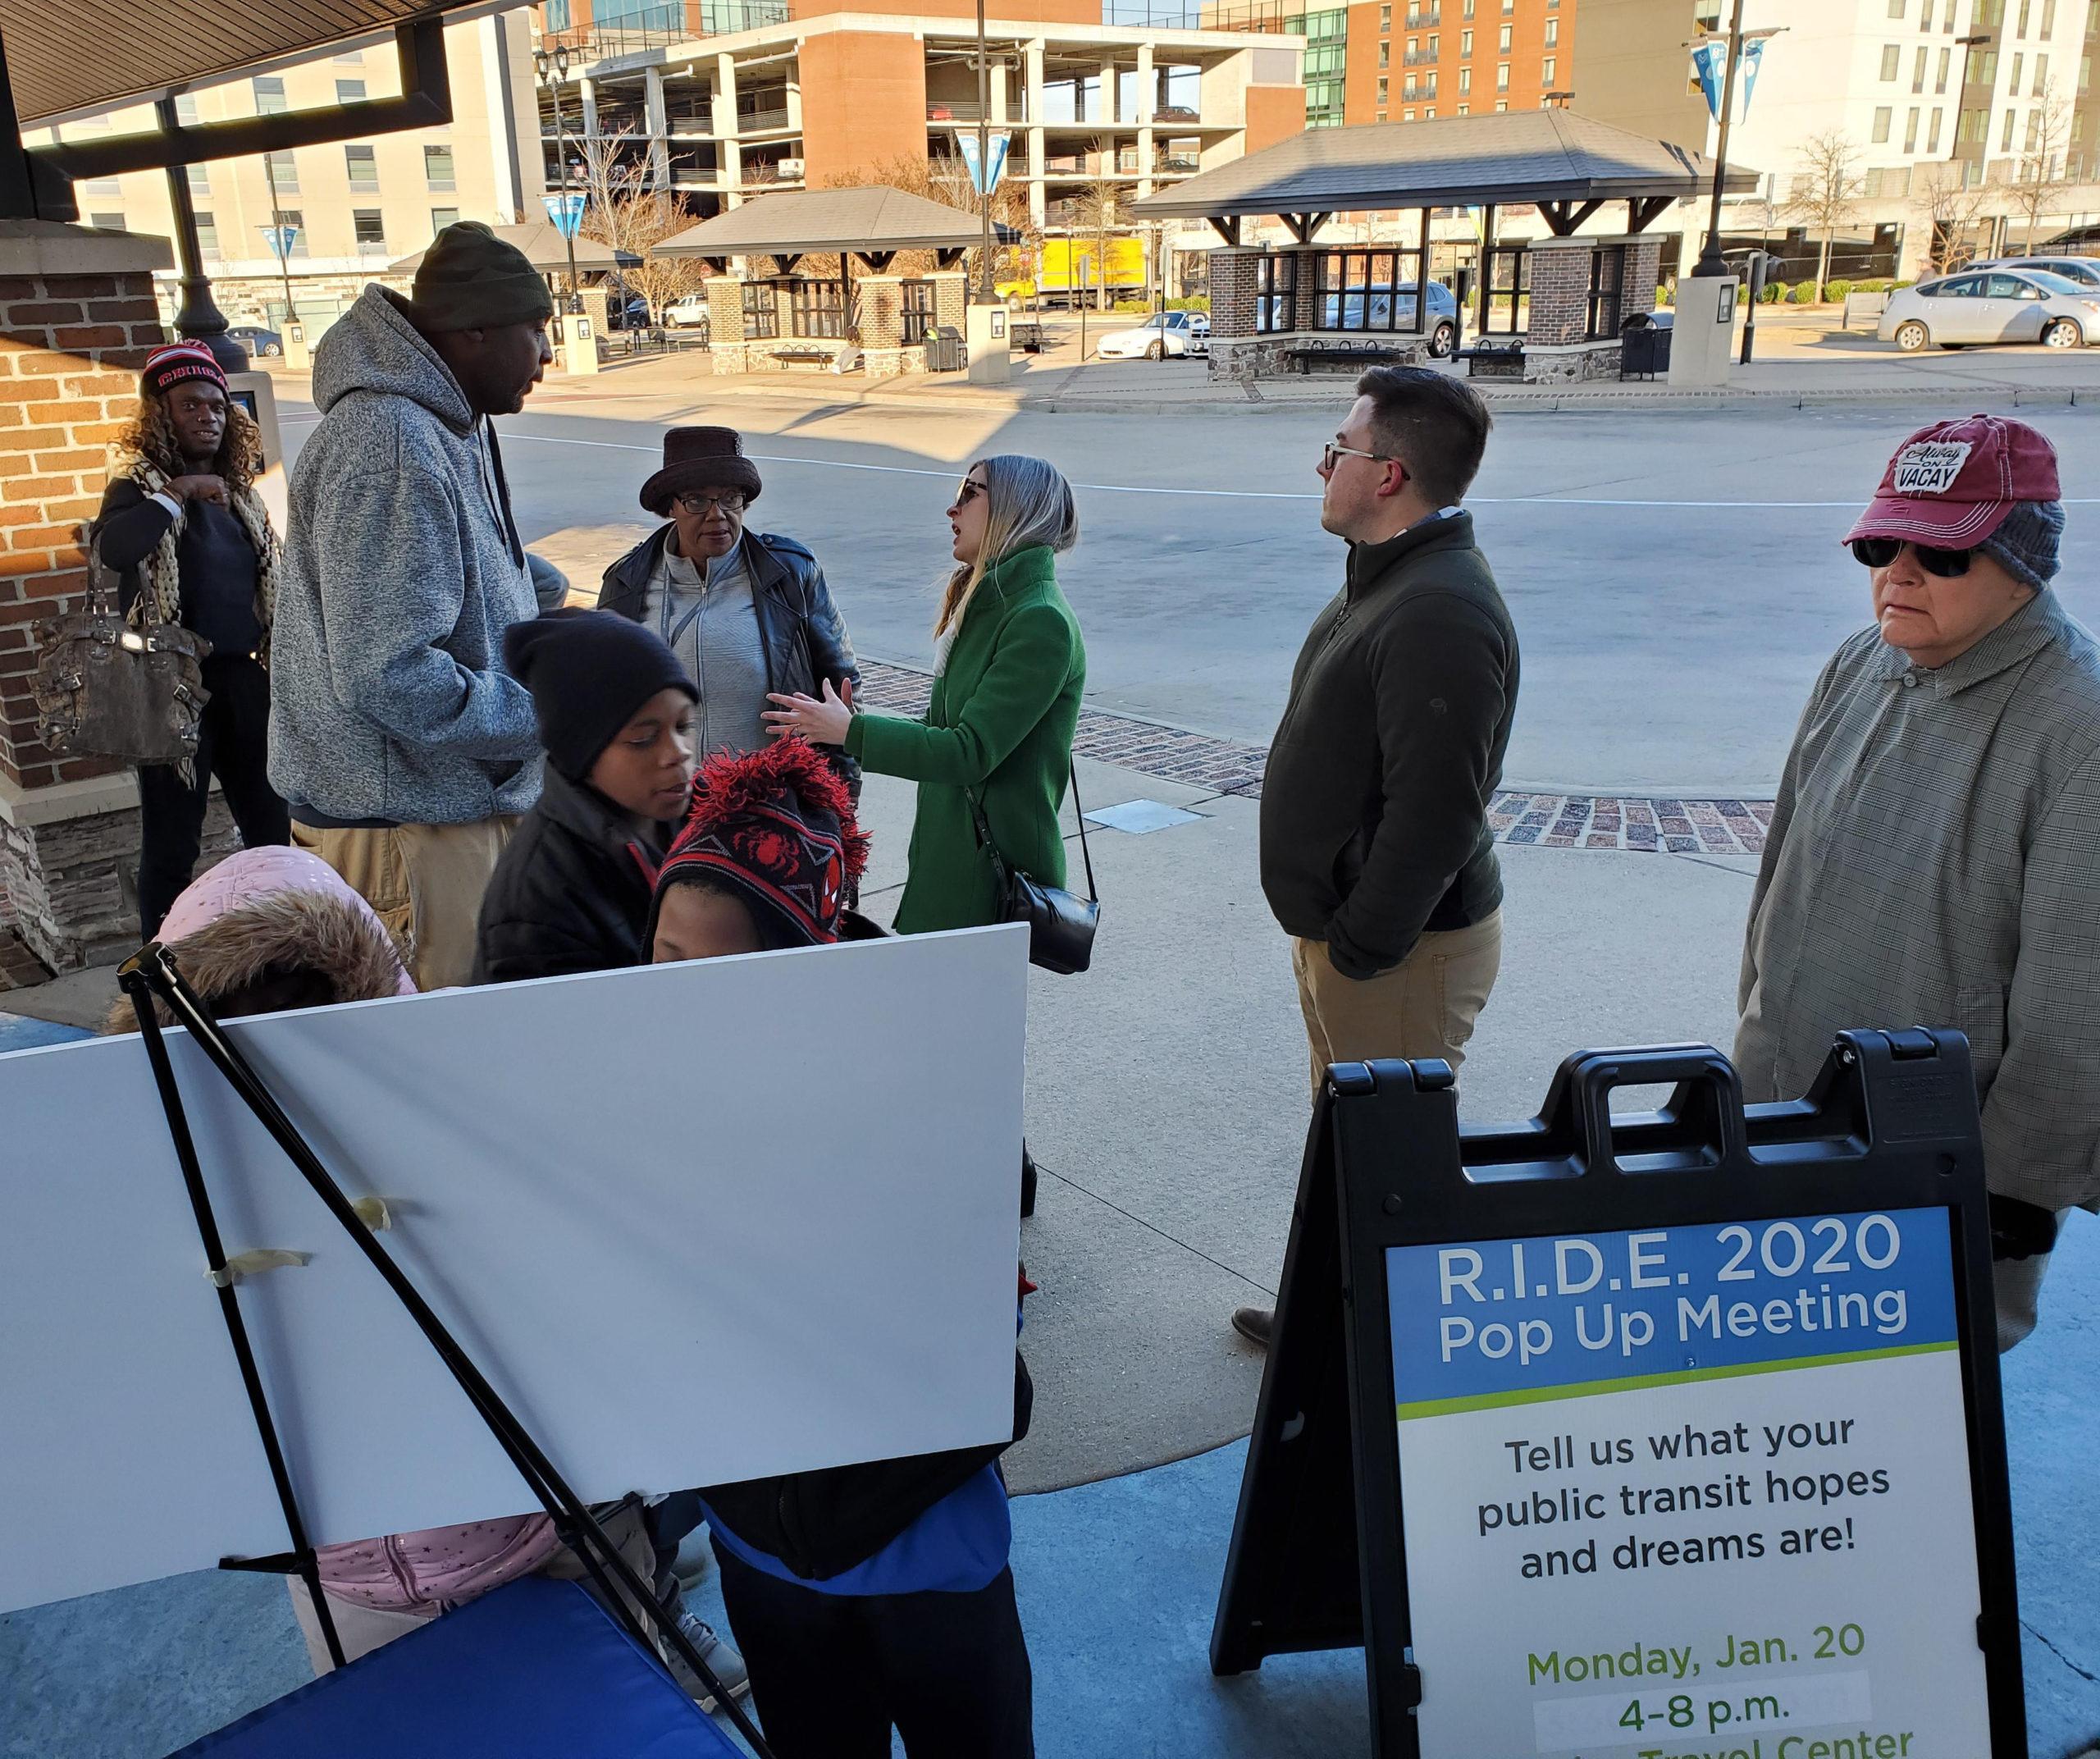 4 Pulaski County meetings seek transit system ideas